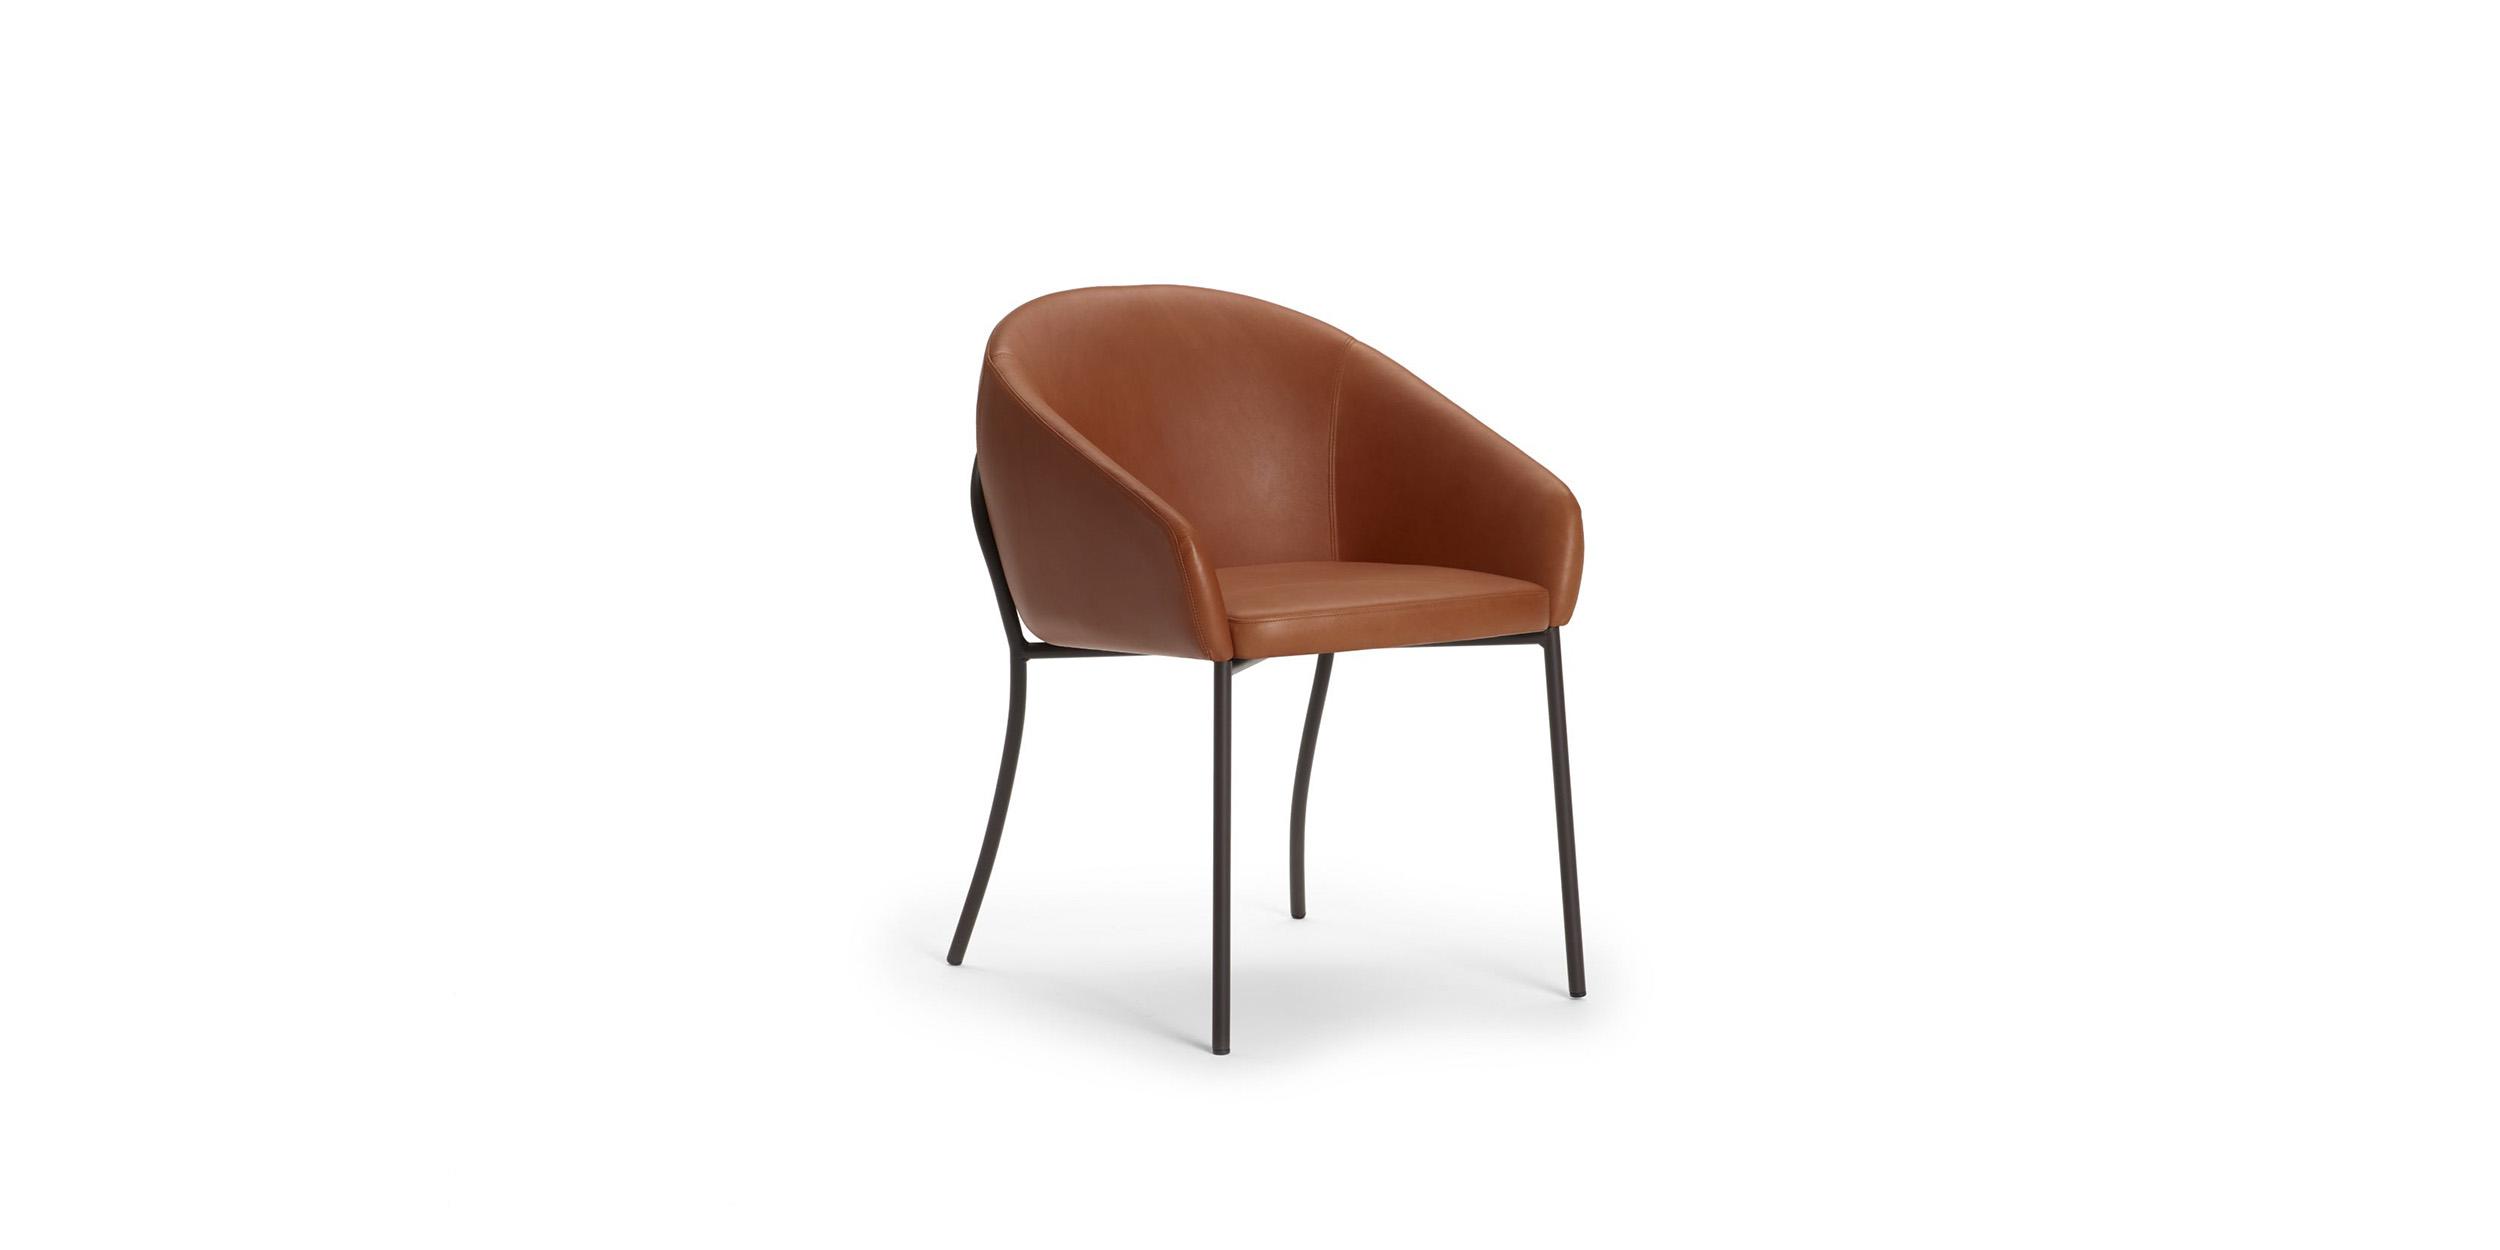 Contour, Armchair by Thomas Sandell